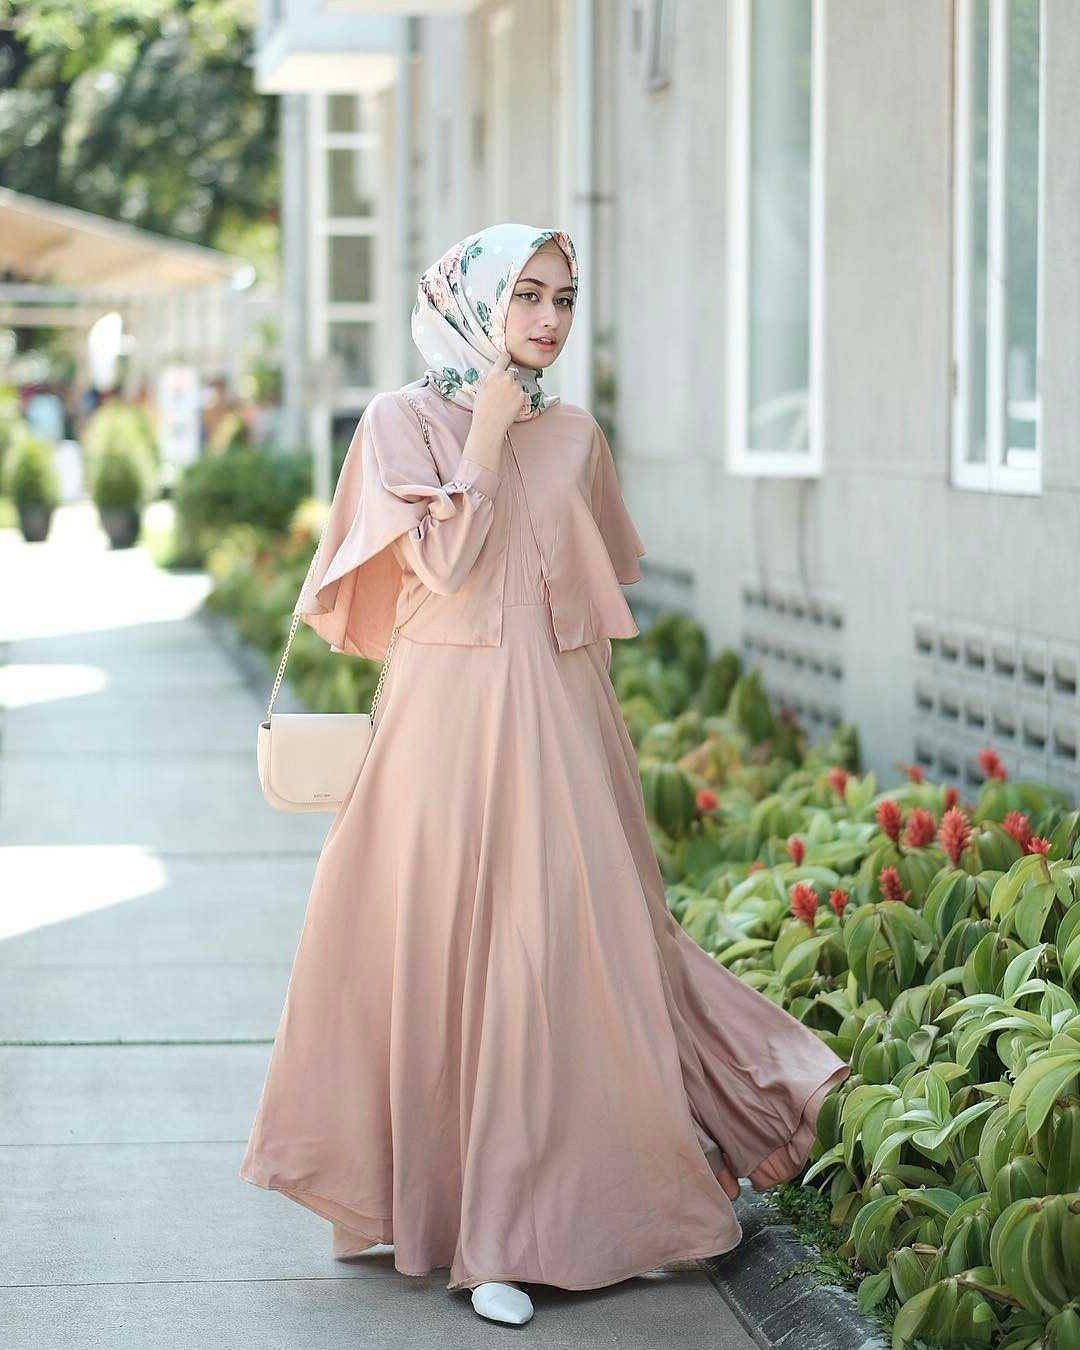 Bentuk Baju Lebaran Model Baru 4pde Model Baju Gamis Terbaru Lebaran Gambar islami